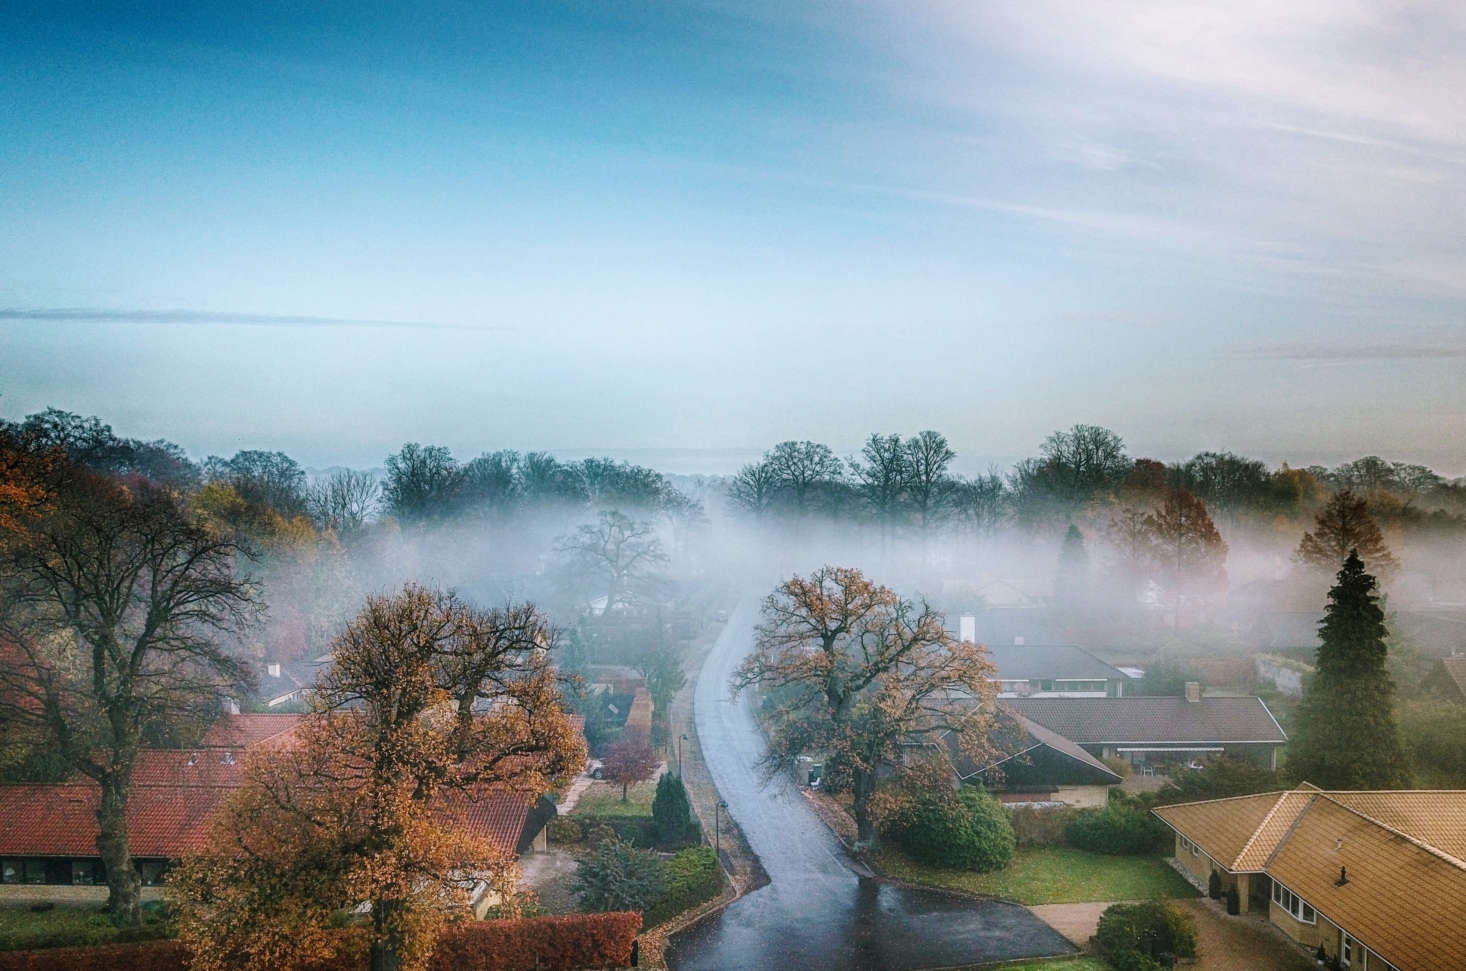 An aerial view of gardens in Ordrup, north of Copenhagen, near where garden designer G.N. Brandt lived. Photograph by Lars Plougmann via Flickr.